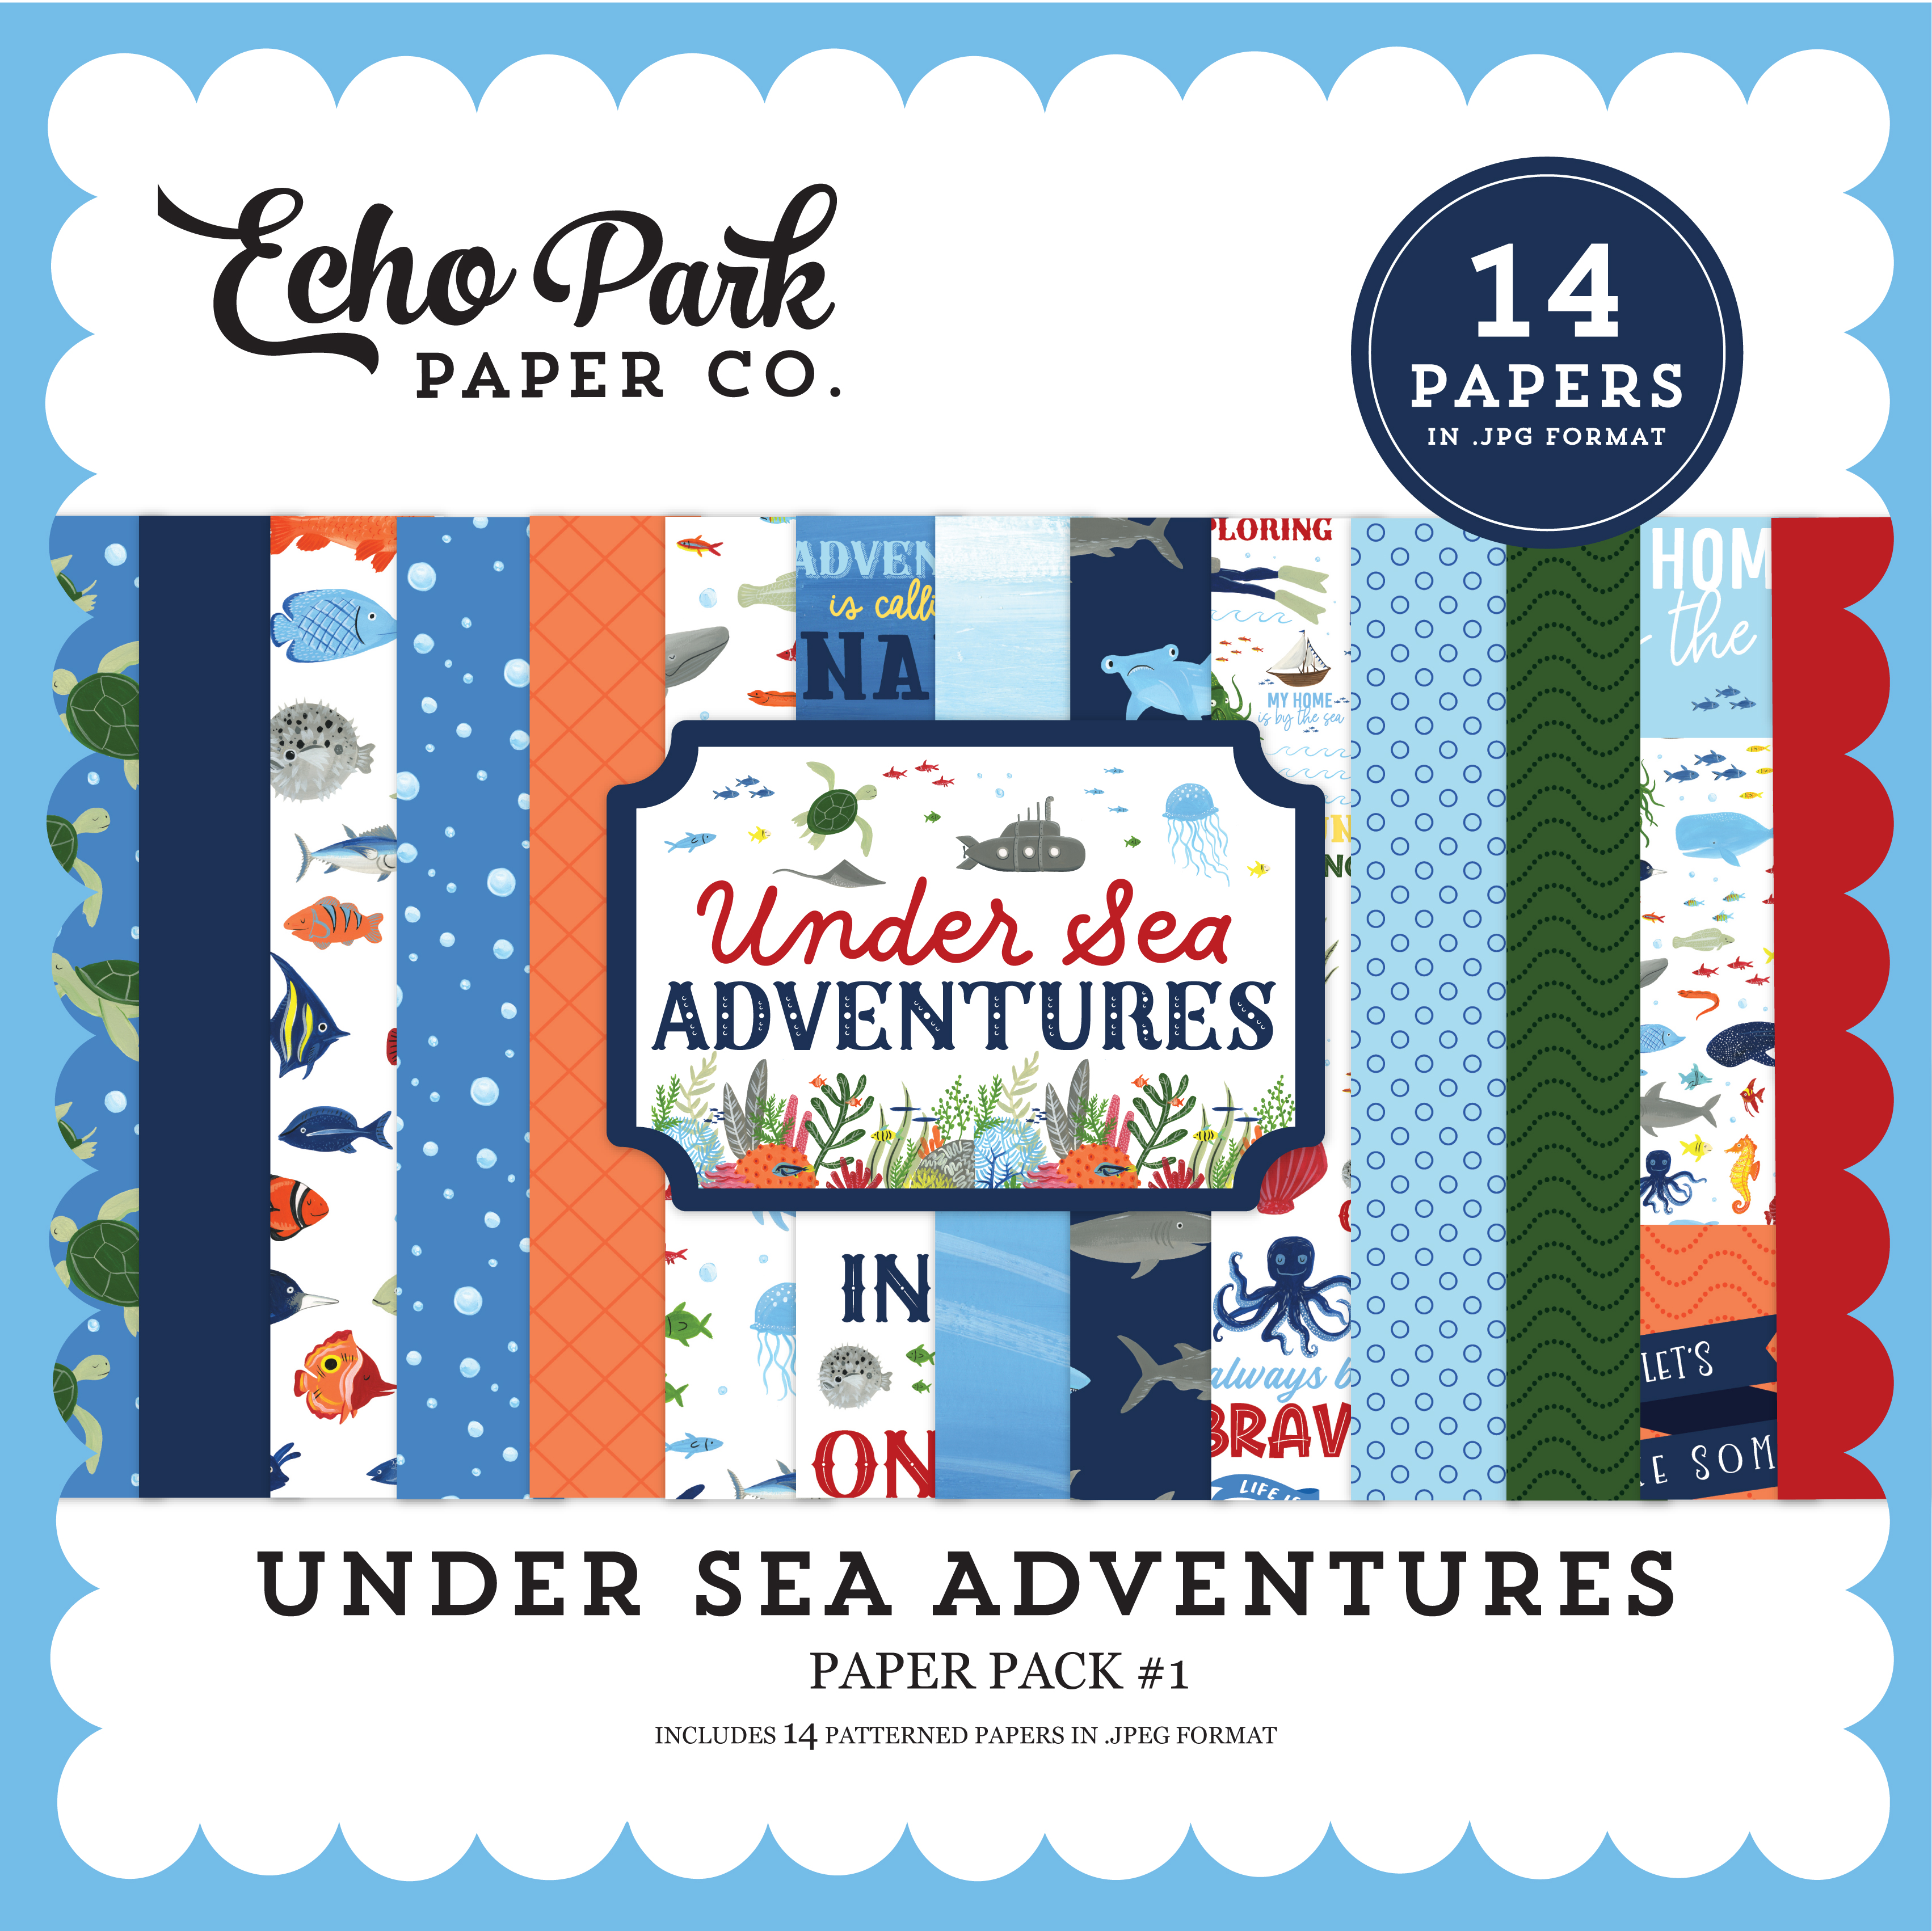 Under Sea Adventures Paper Pack #1